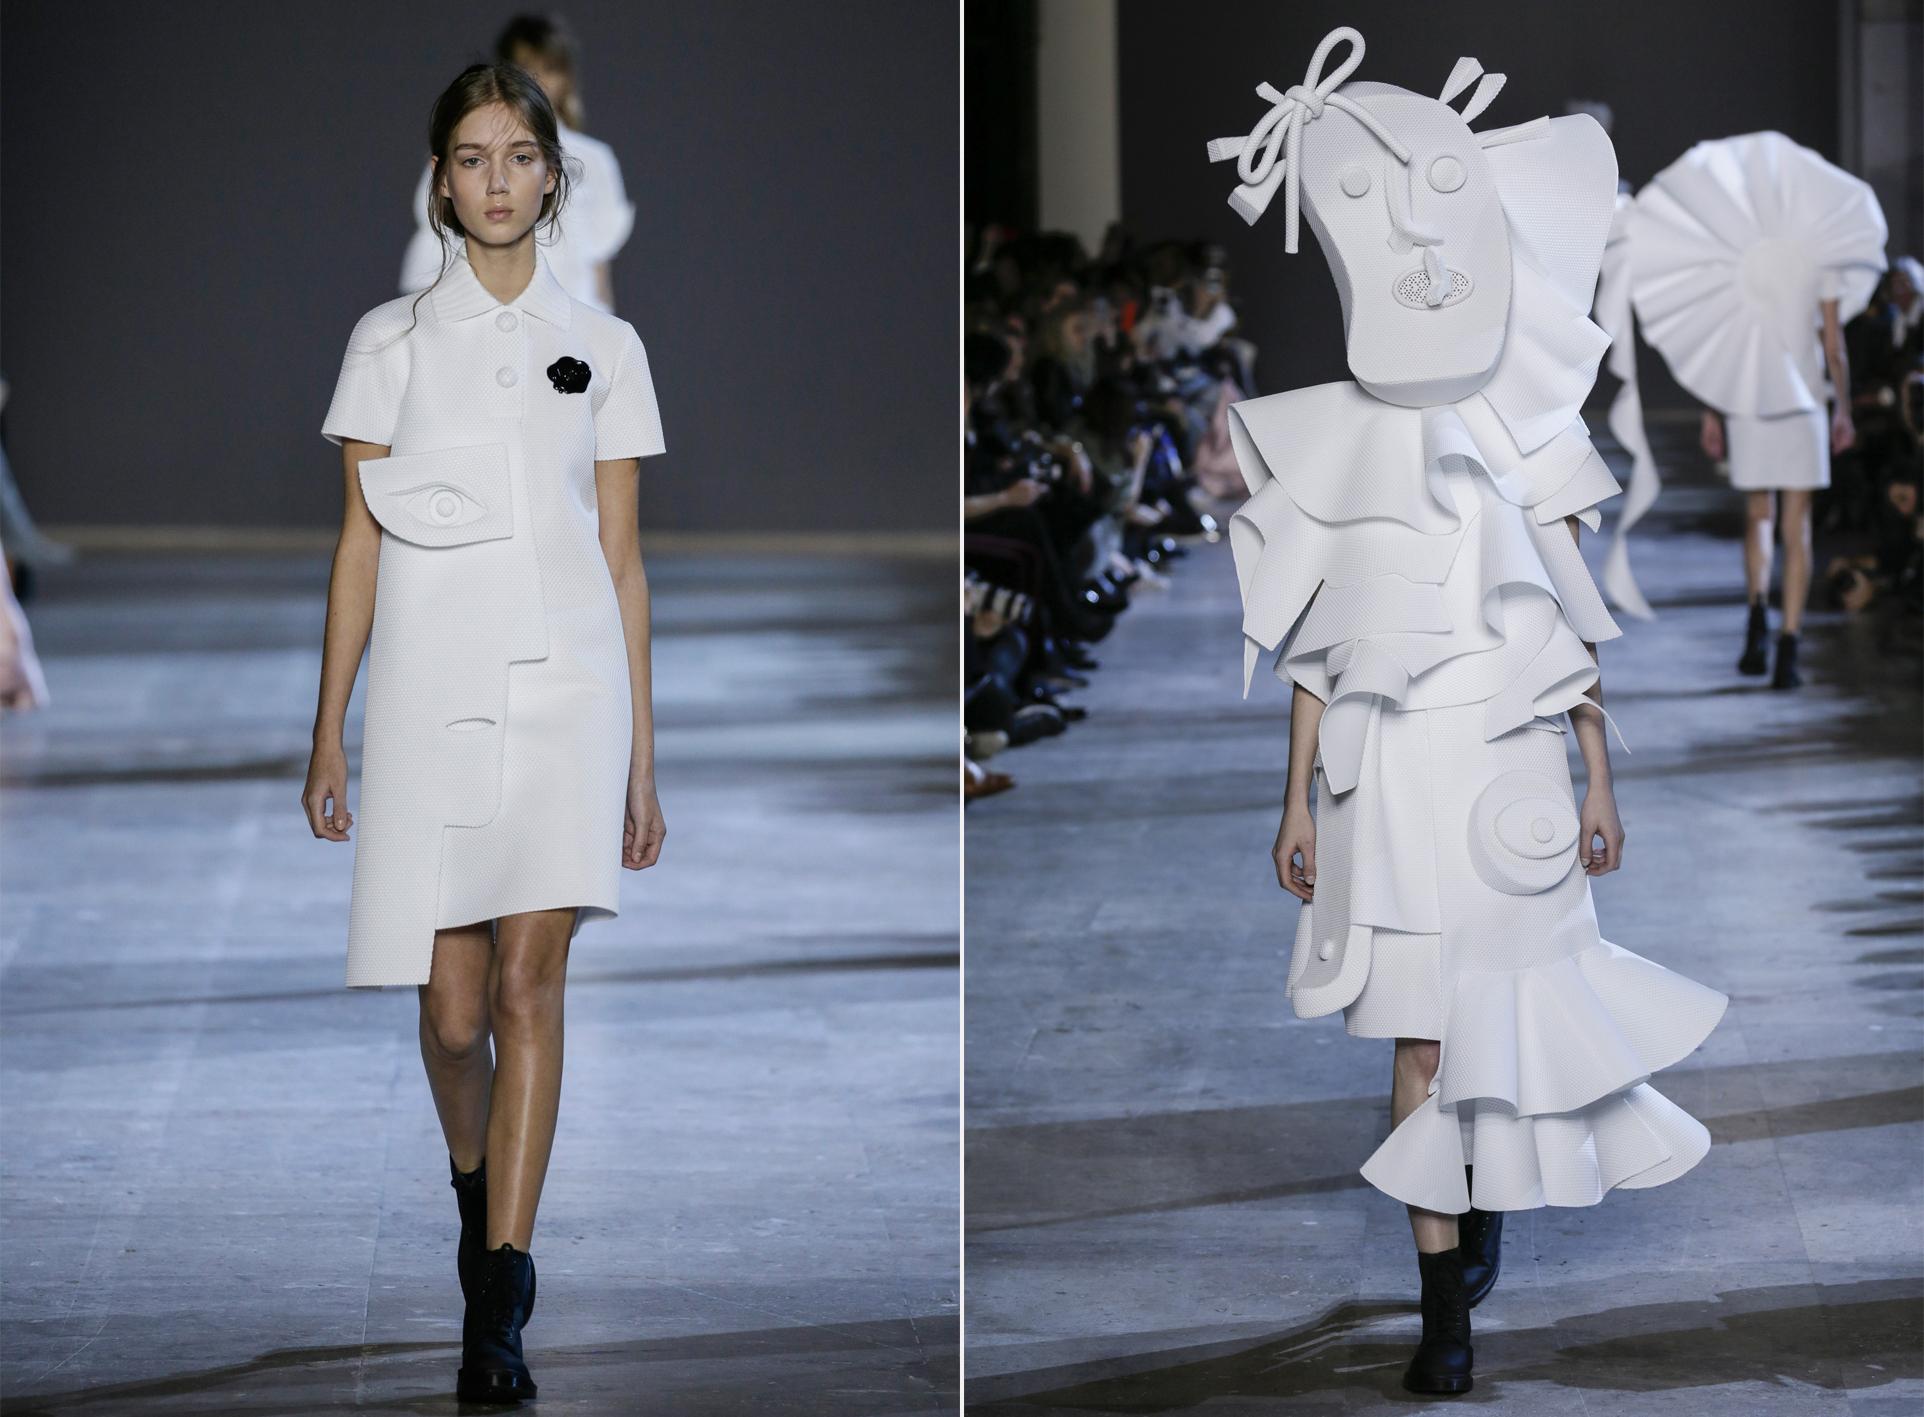 Viktor & Rolf Spring 2016 Haute Couture / фото Alessandro Garofalo